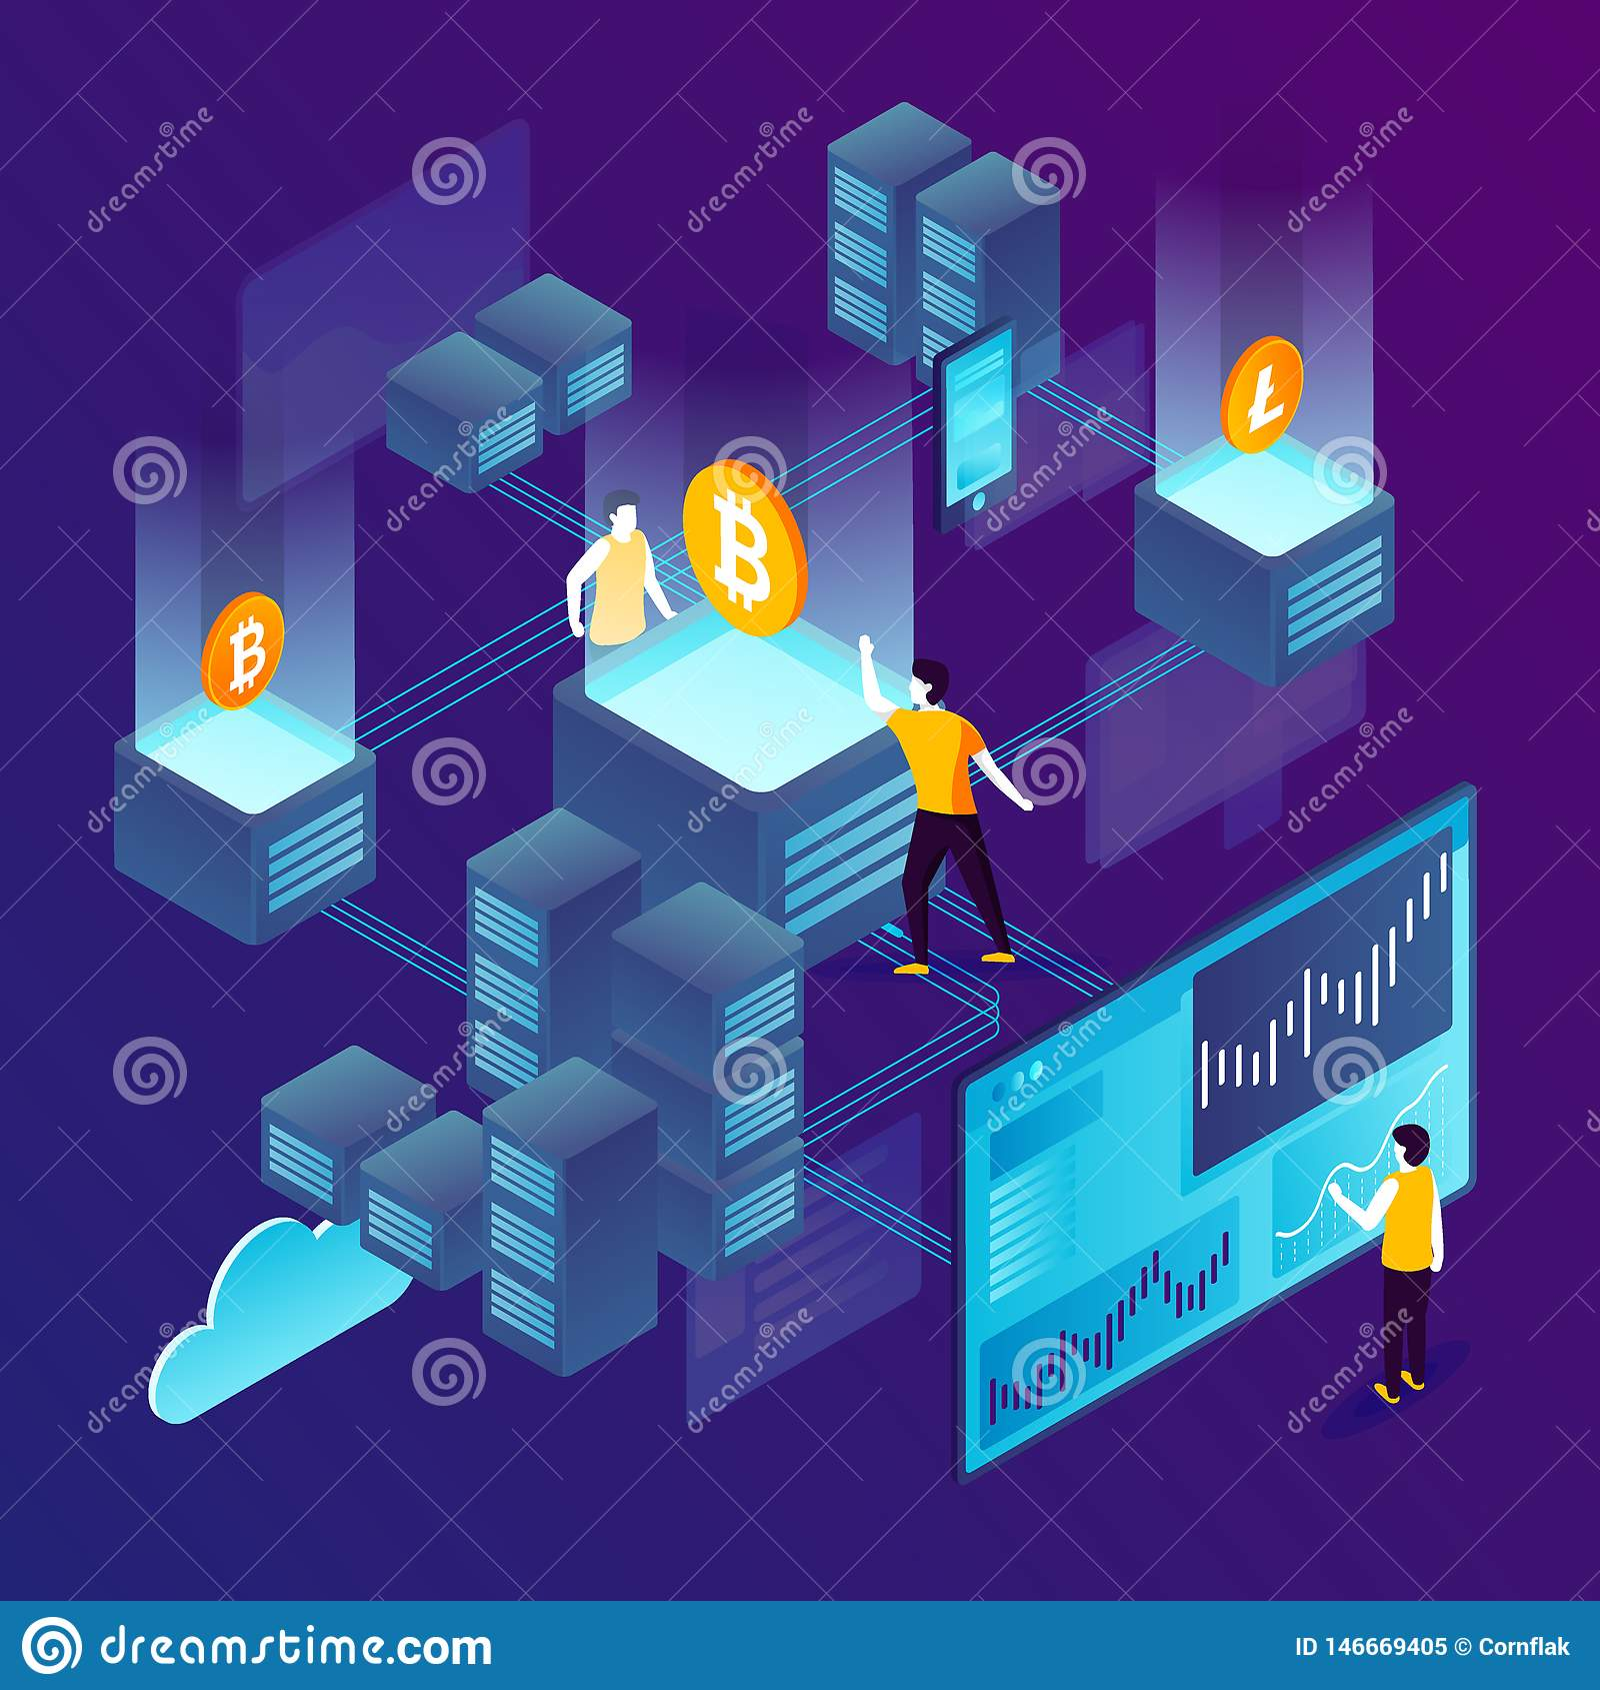 make money crypto trading